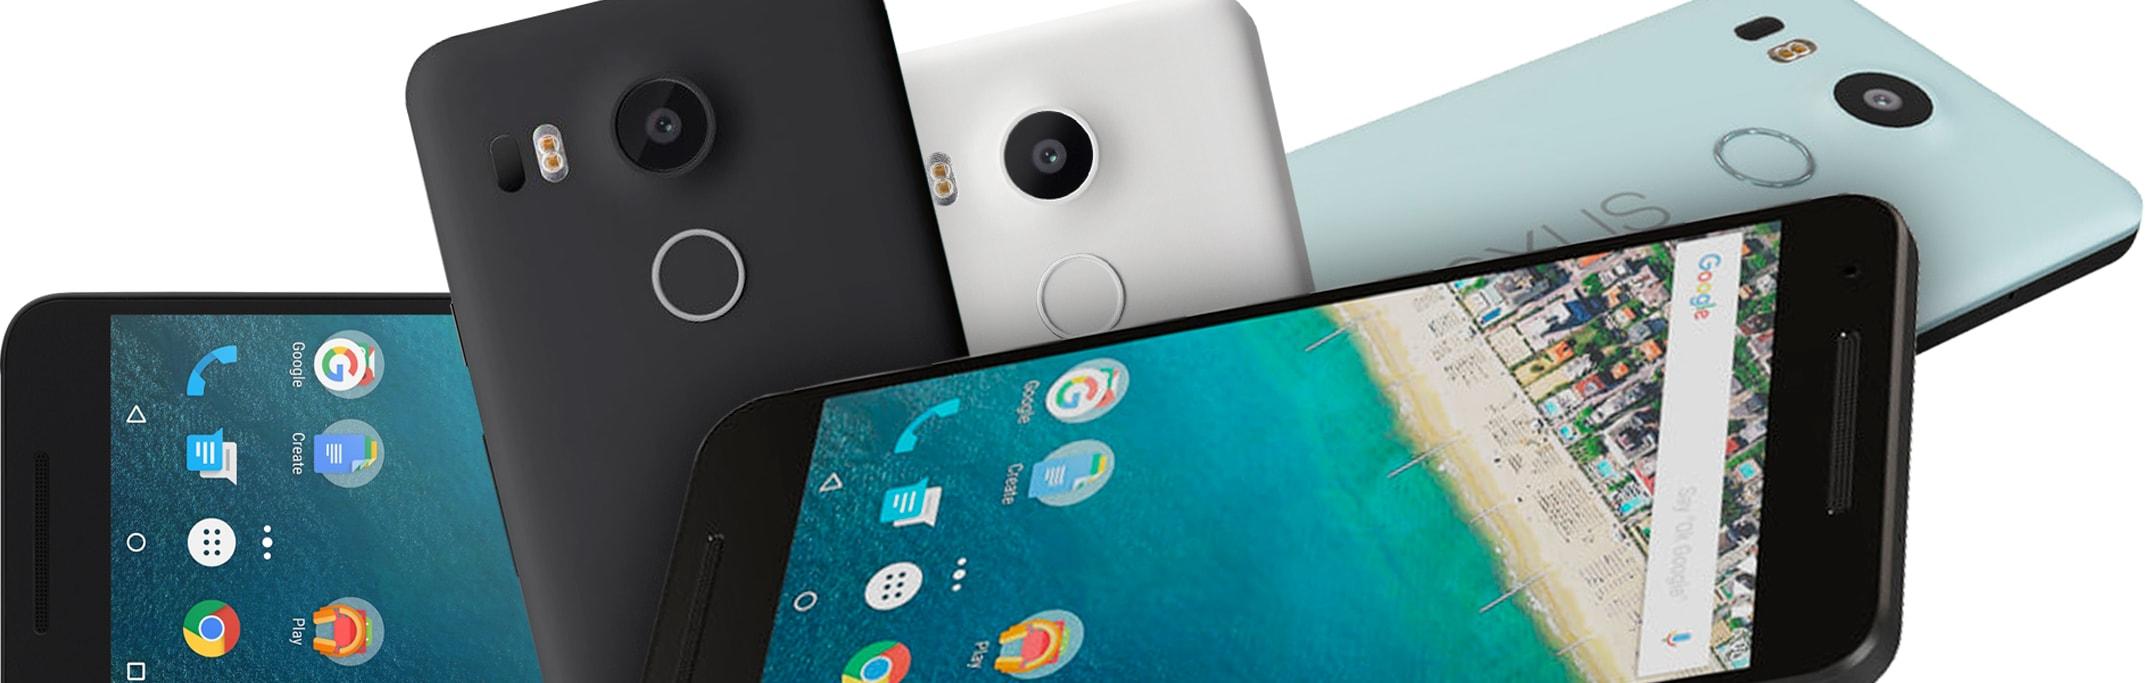 Google Nexus 5X (H791F)